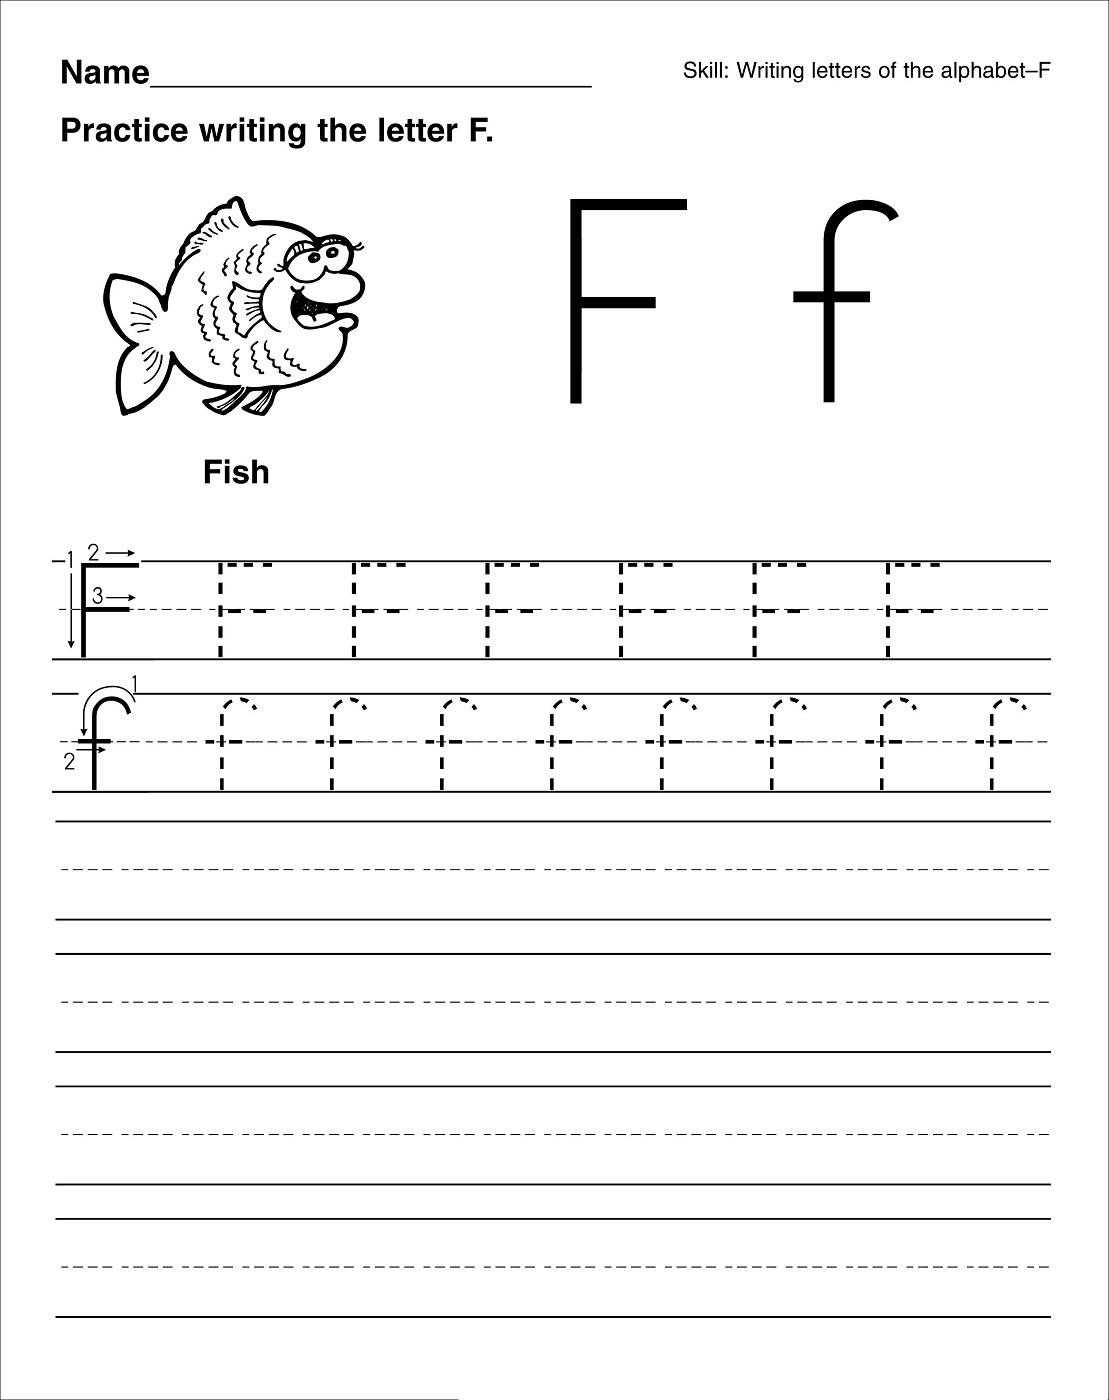 Letter F Worksheets Free Printable | Loving Printable in Letter F Worksheets Pdf Free